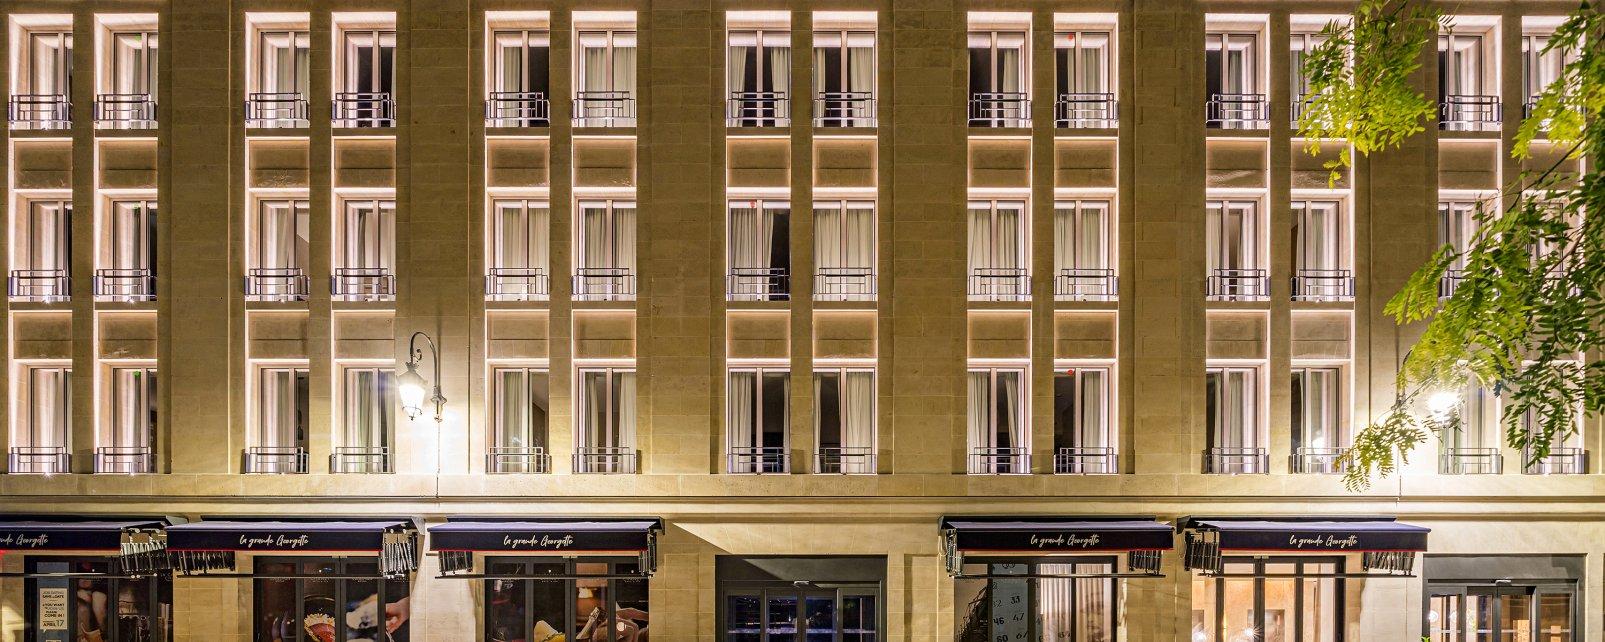 Hôtel La Caserne Chanzy